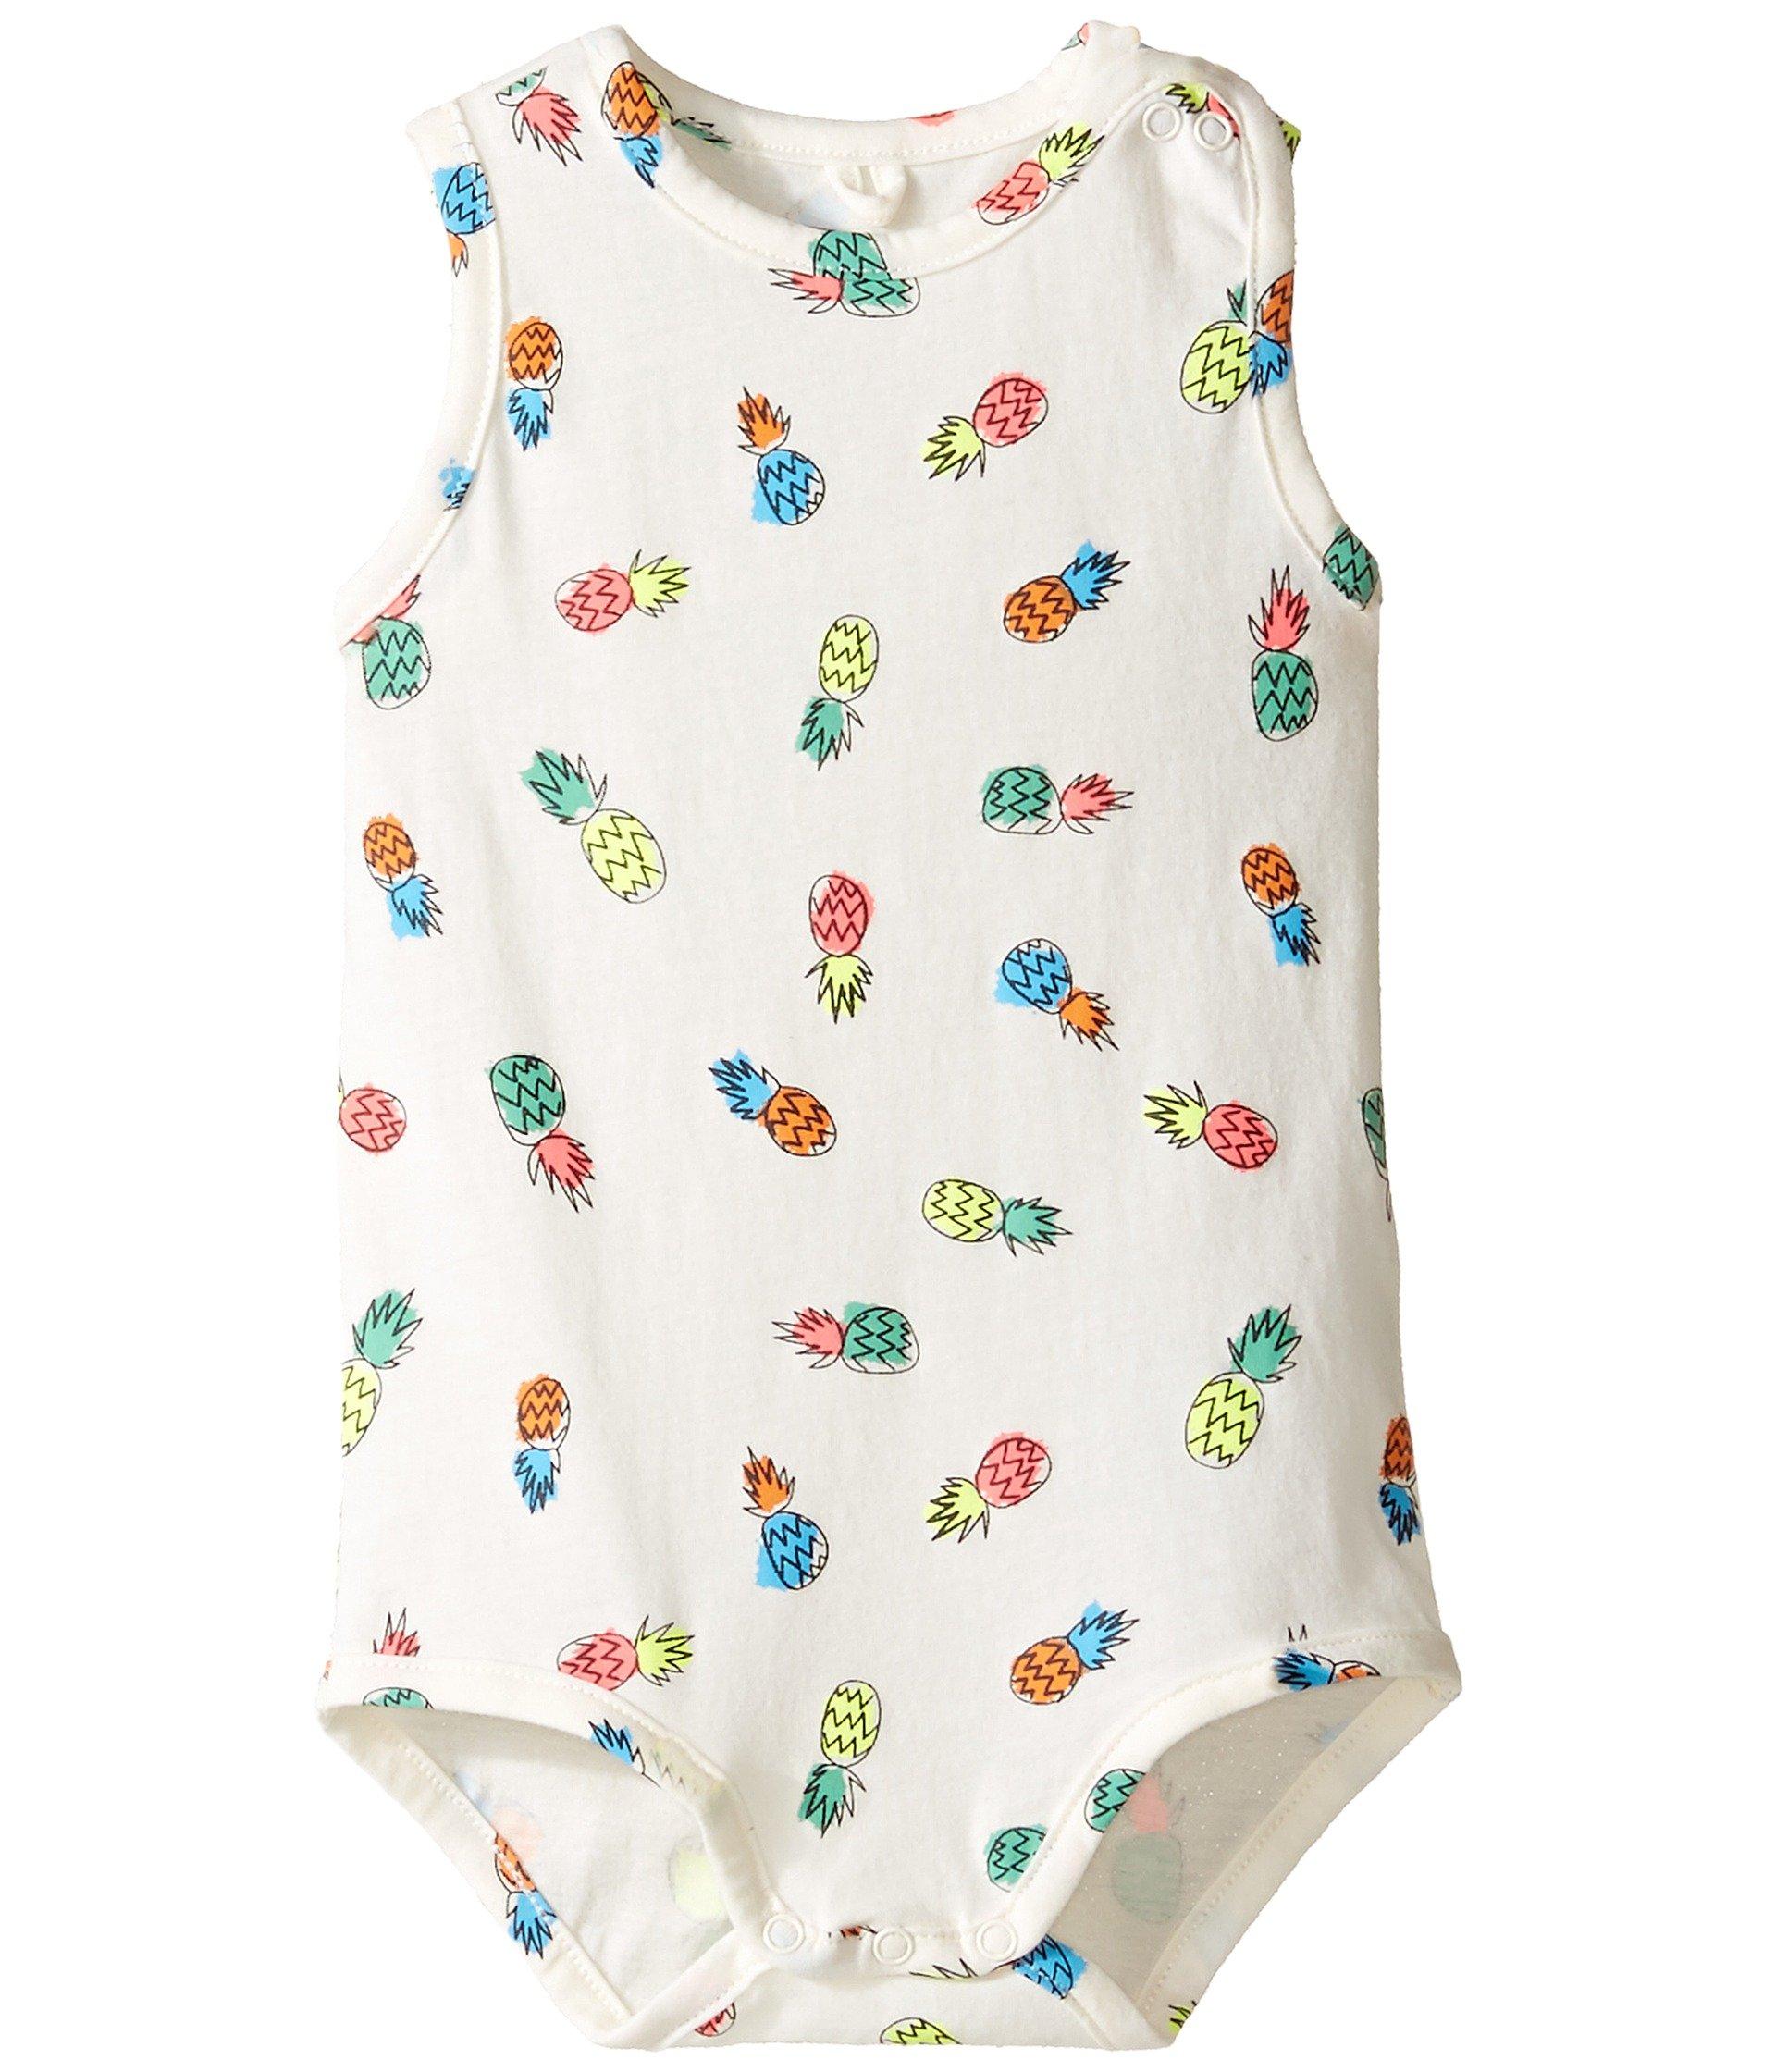 Enterizo para Bebe Stella McCartney Kids Gizmo All Over Pineapple Print Body (Infant)  + Stella McCartney en VeoyCompro.net